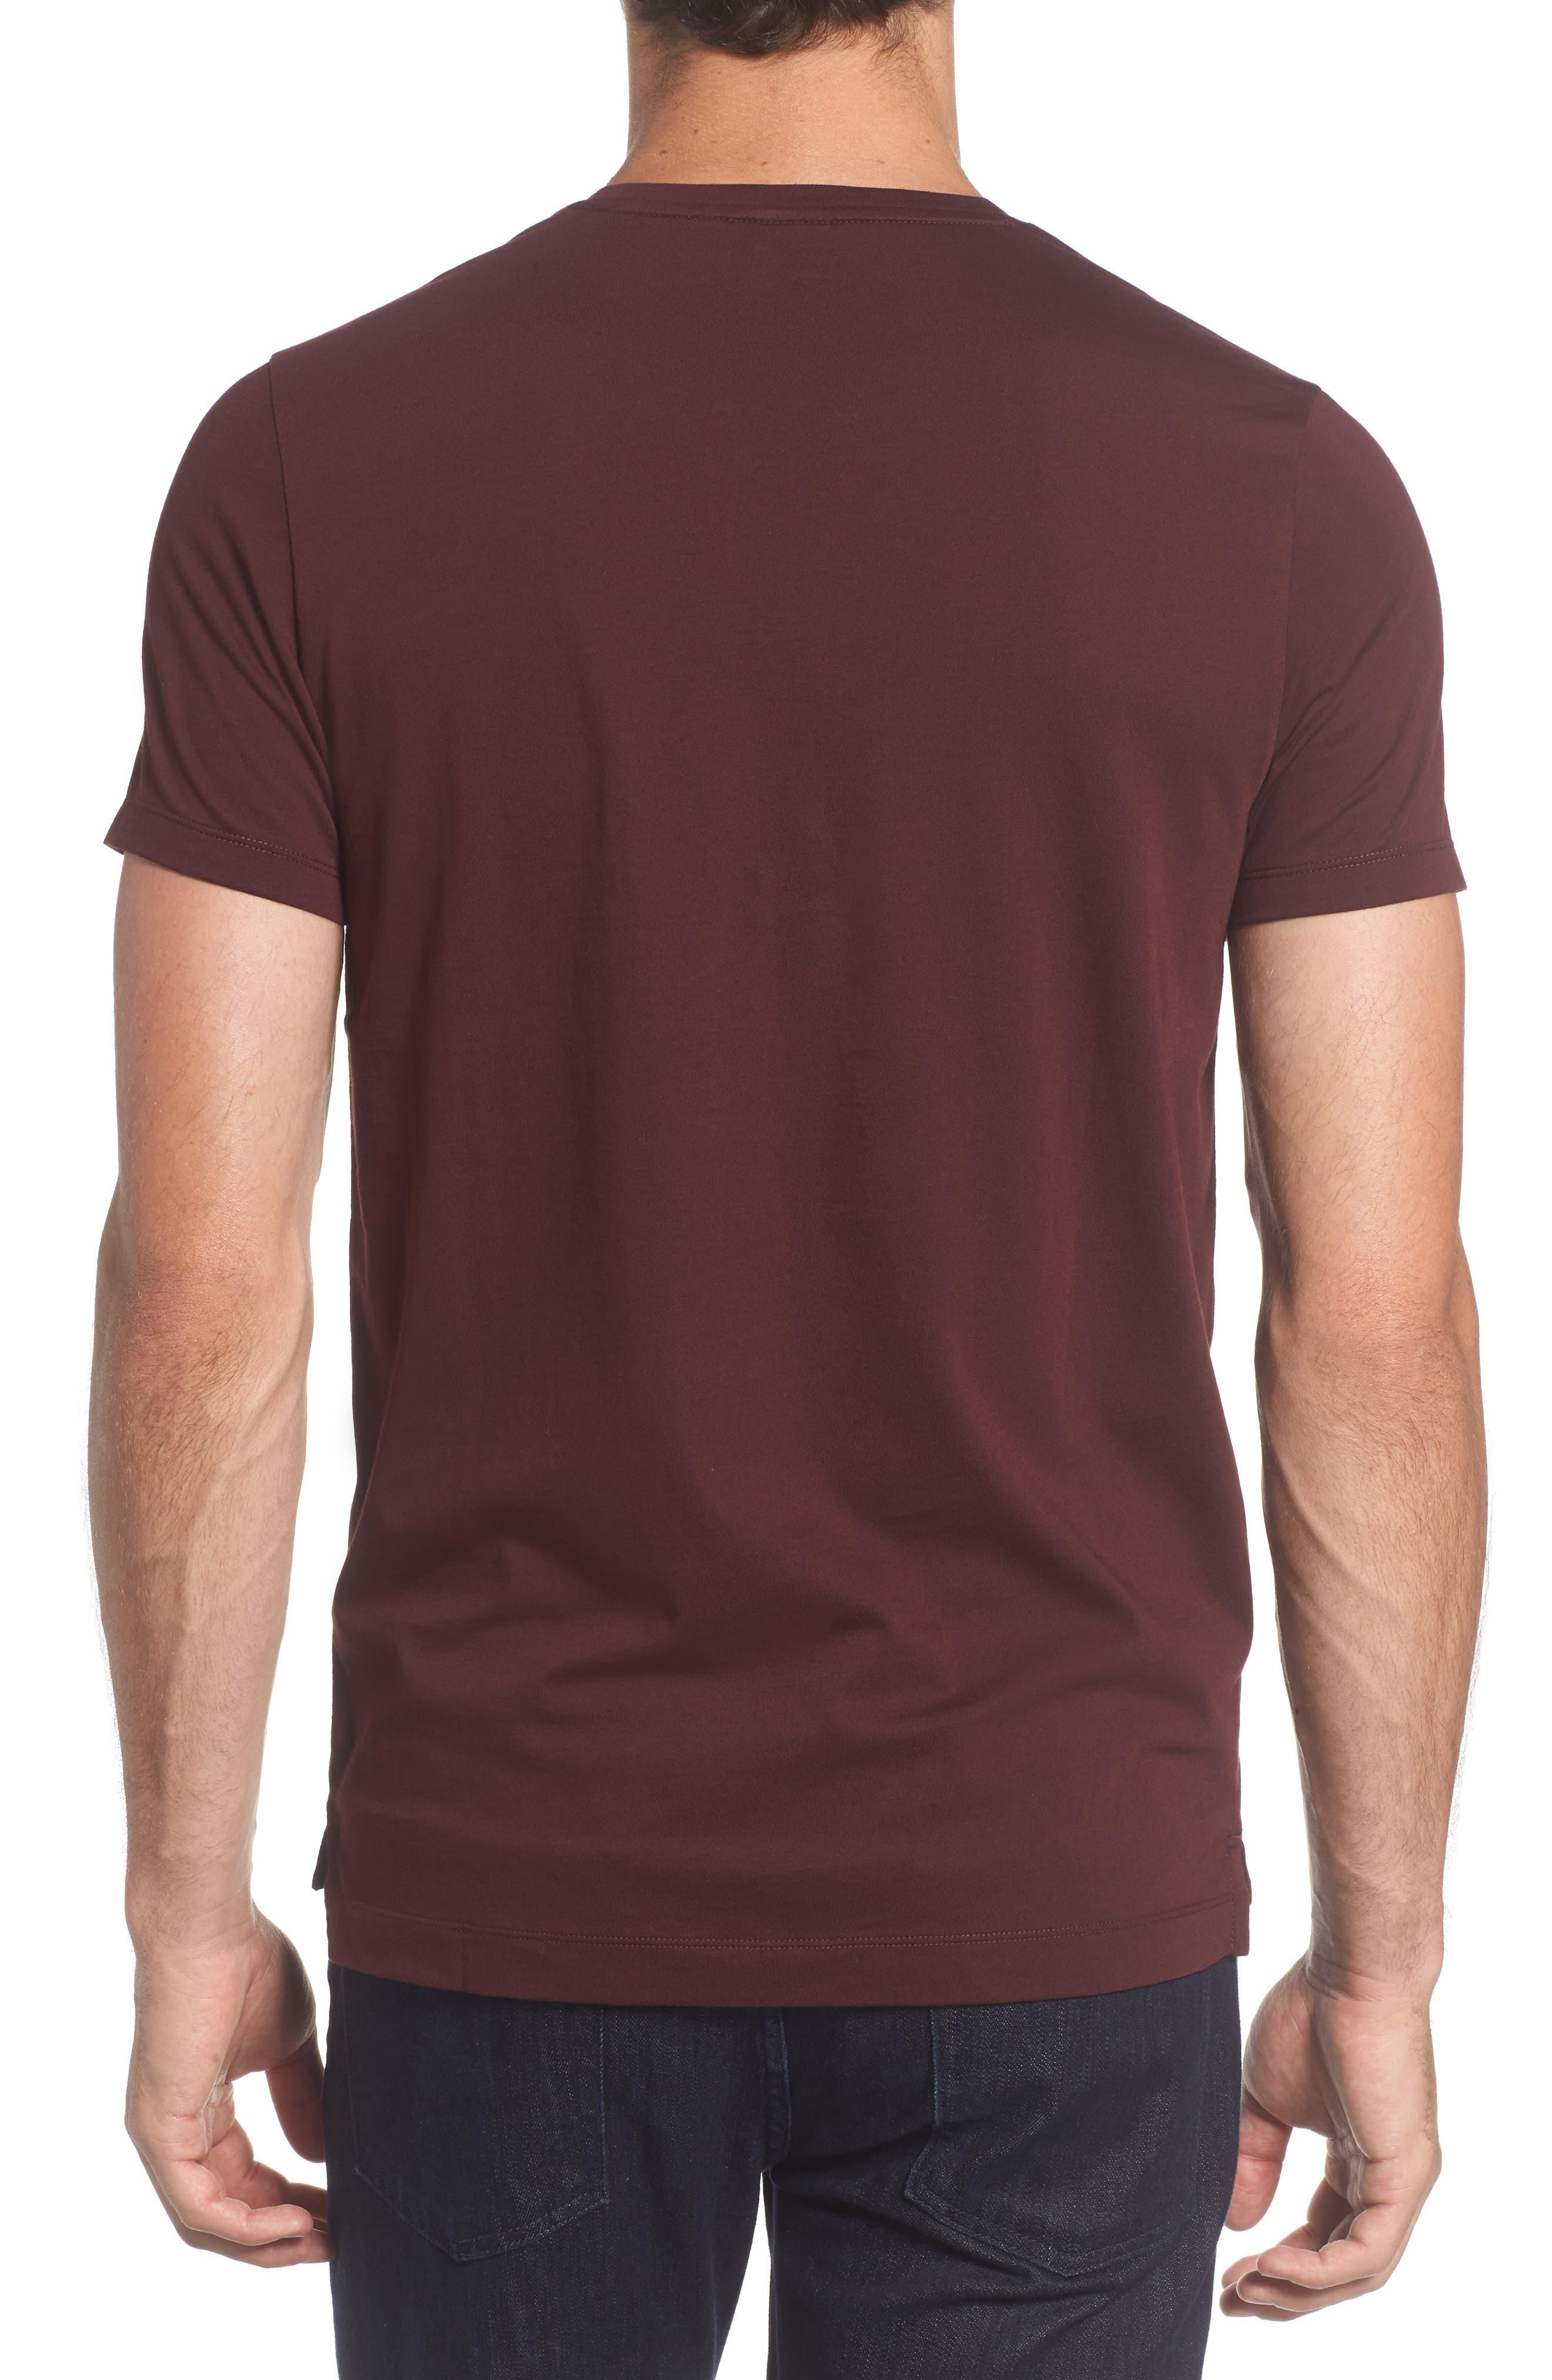 Tessler Crewneck T-Shirt,                             Alternate thumbnail 7, color,                             Black